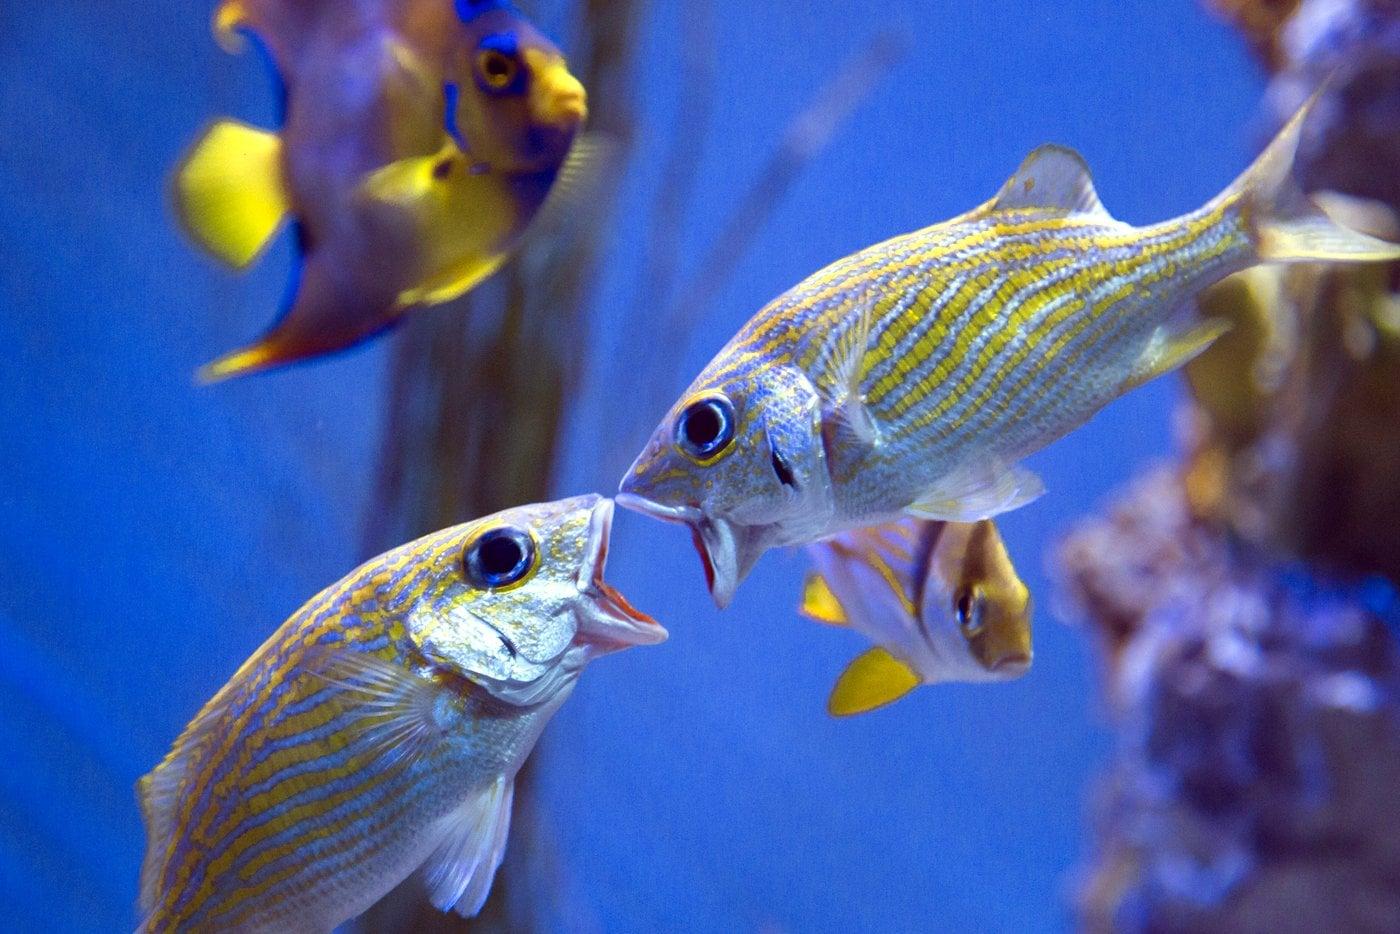 Funny fish faces in an aquarium tank